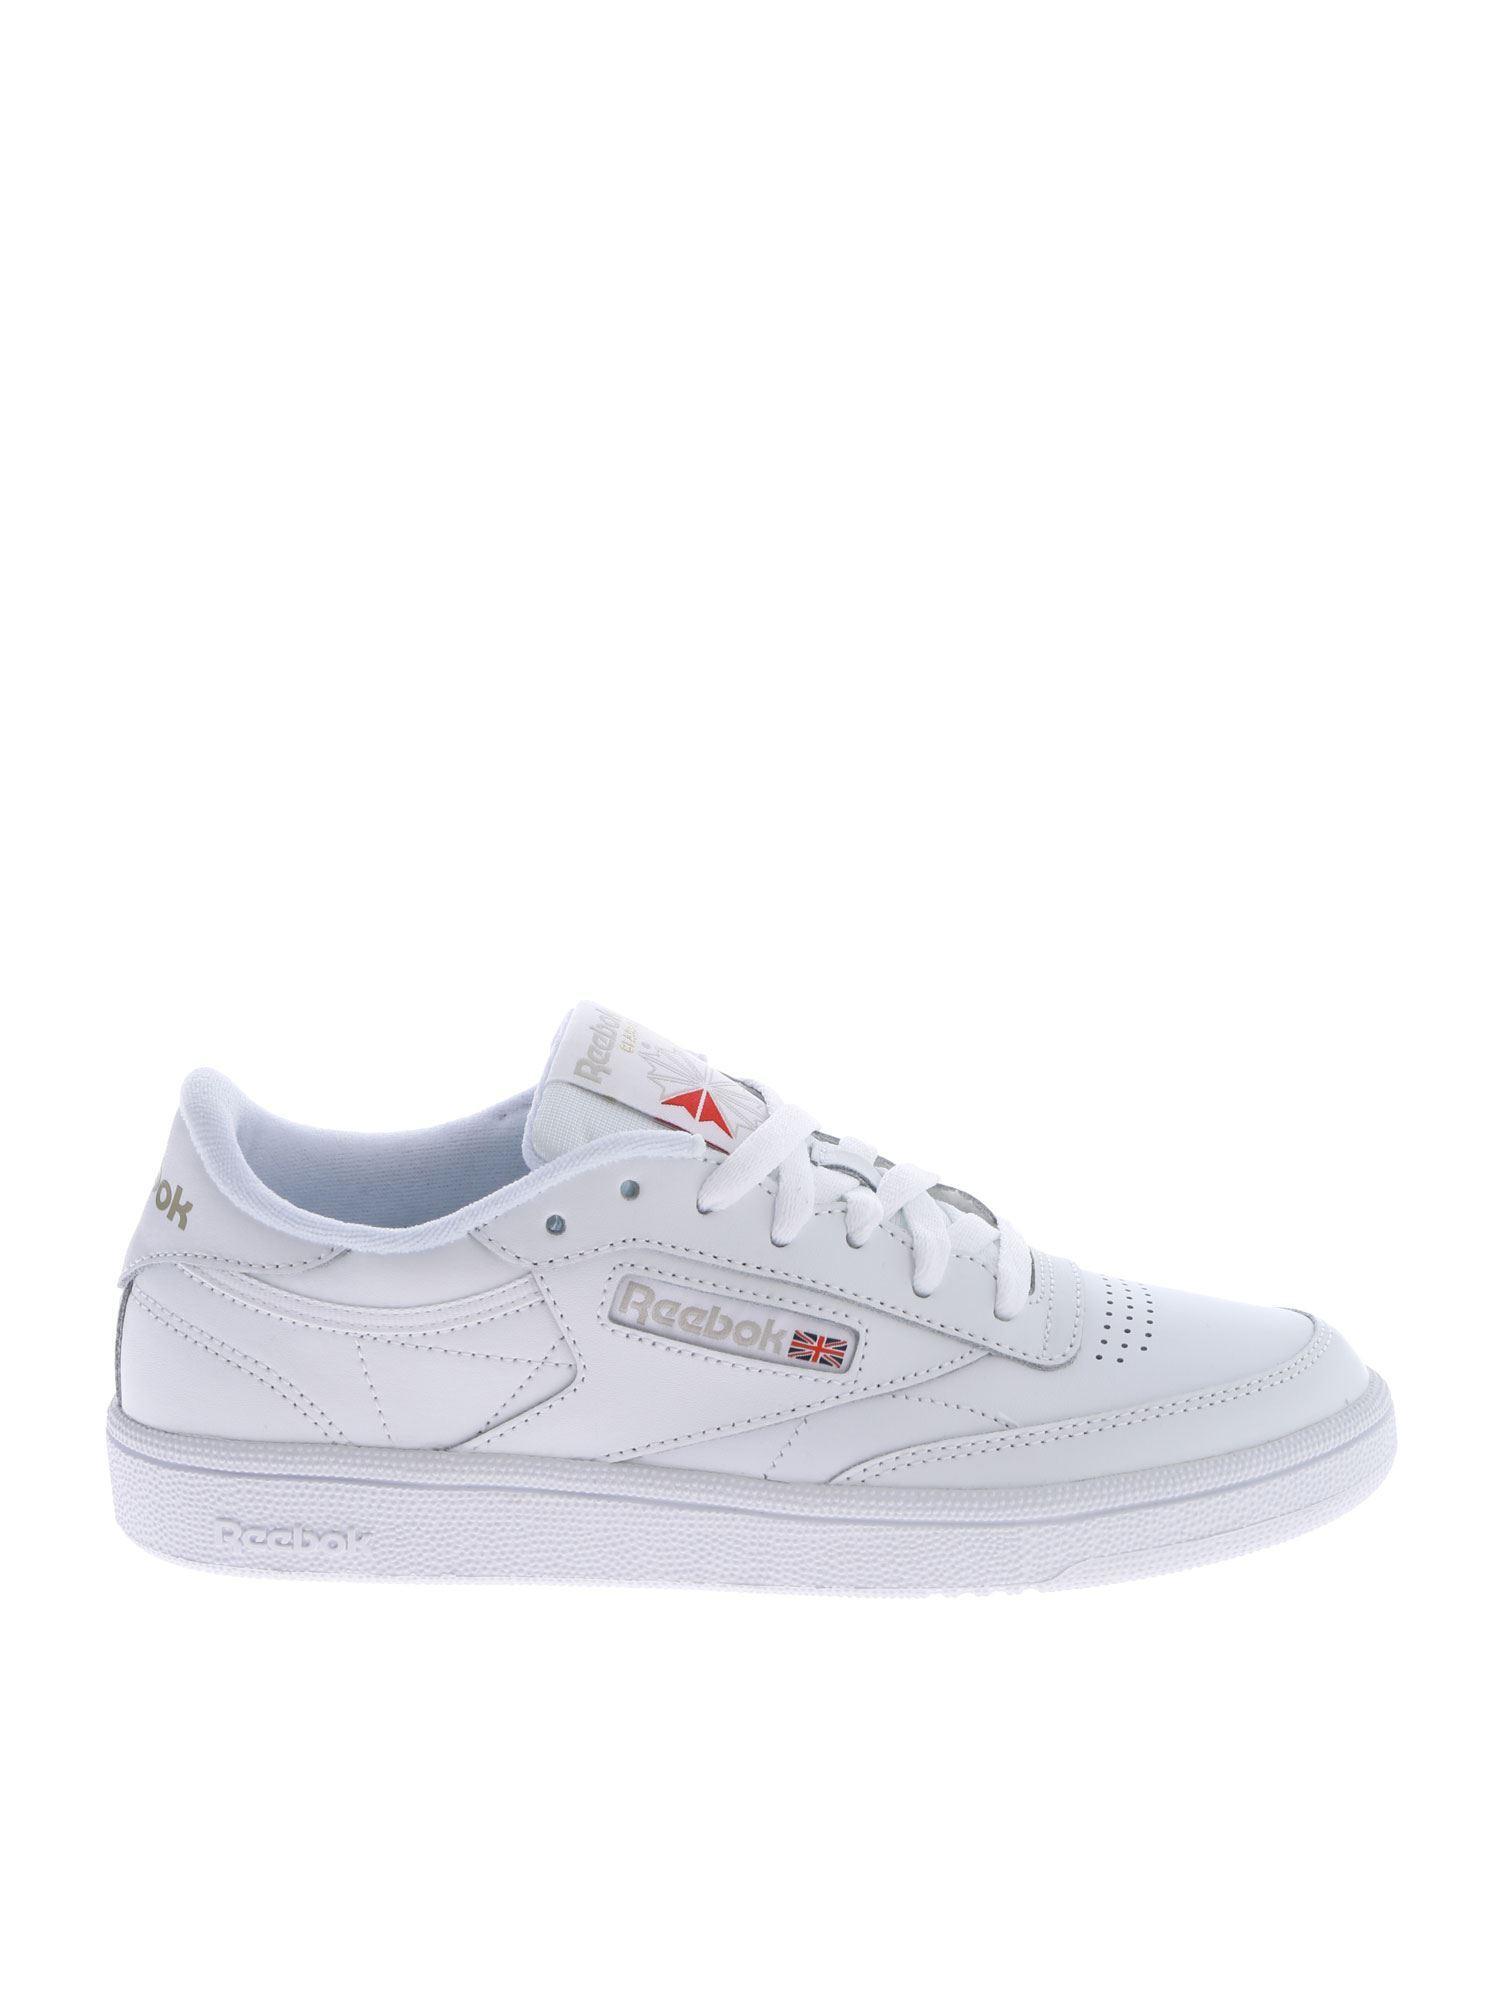 Lyst - Reebok Club C 85 White Sneakers in White 03b65b30b